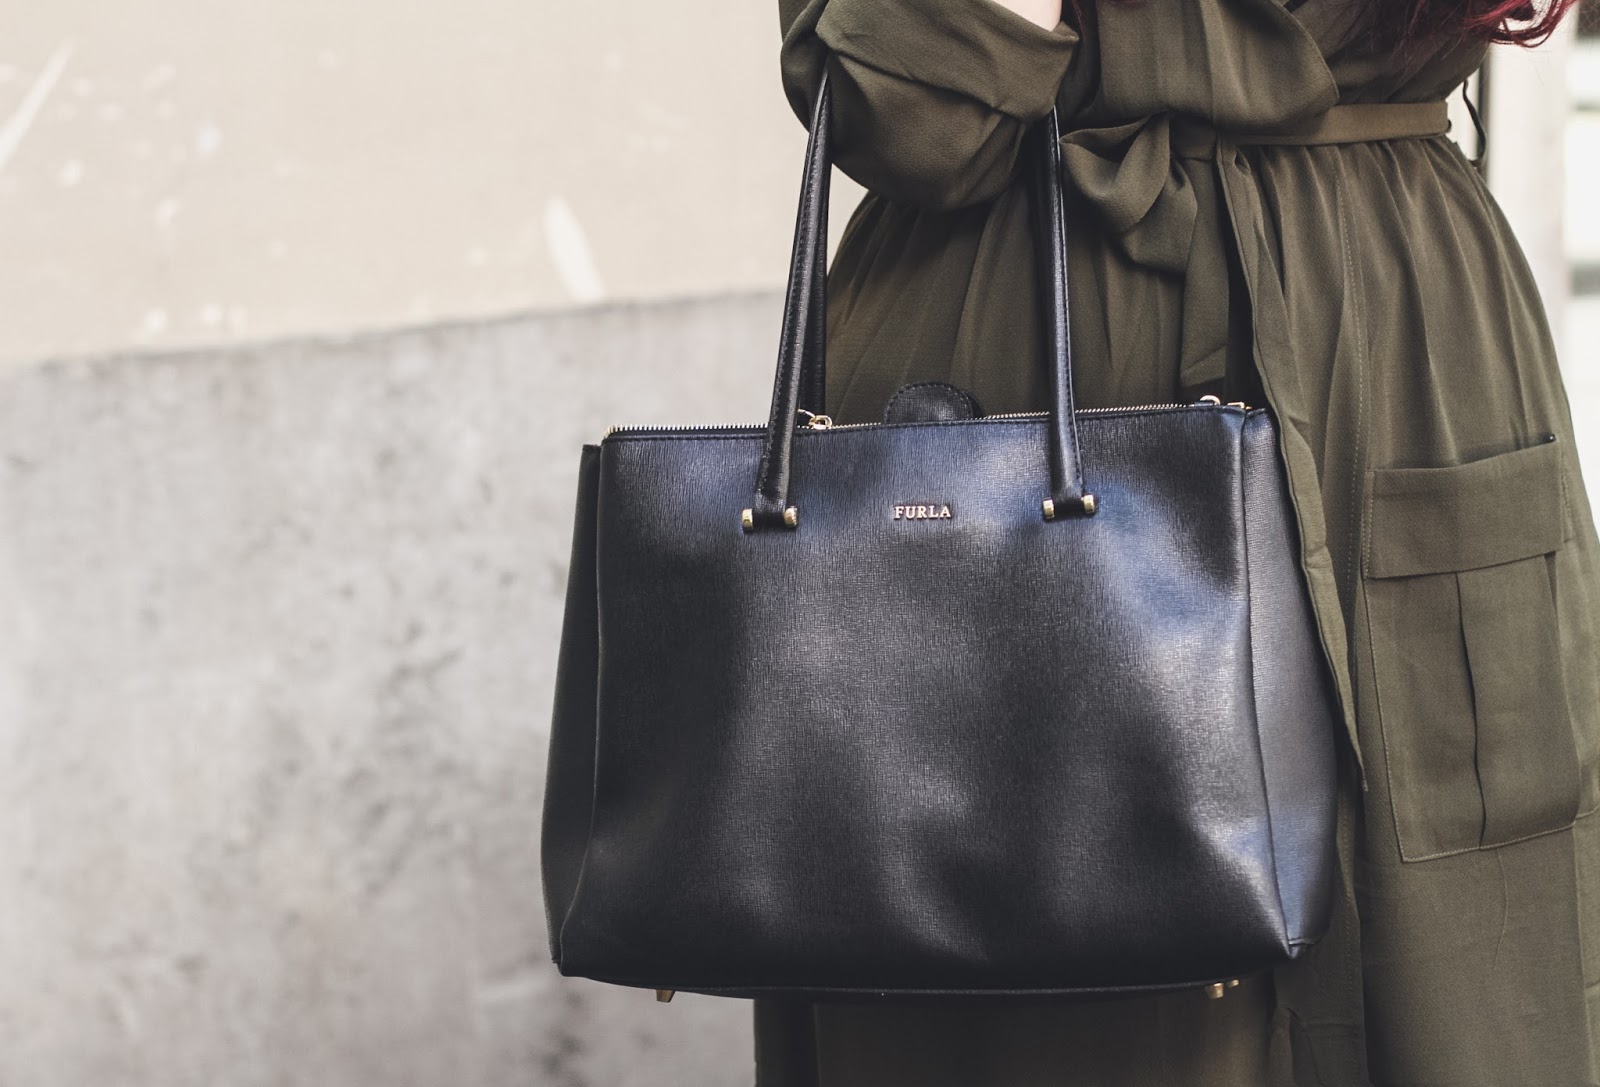 sac furla